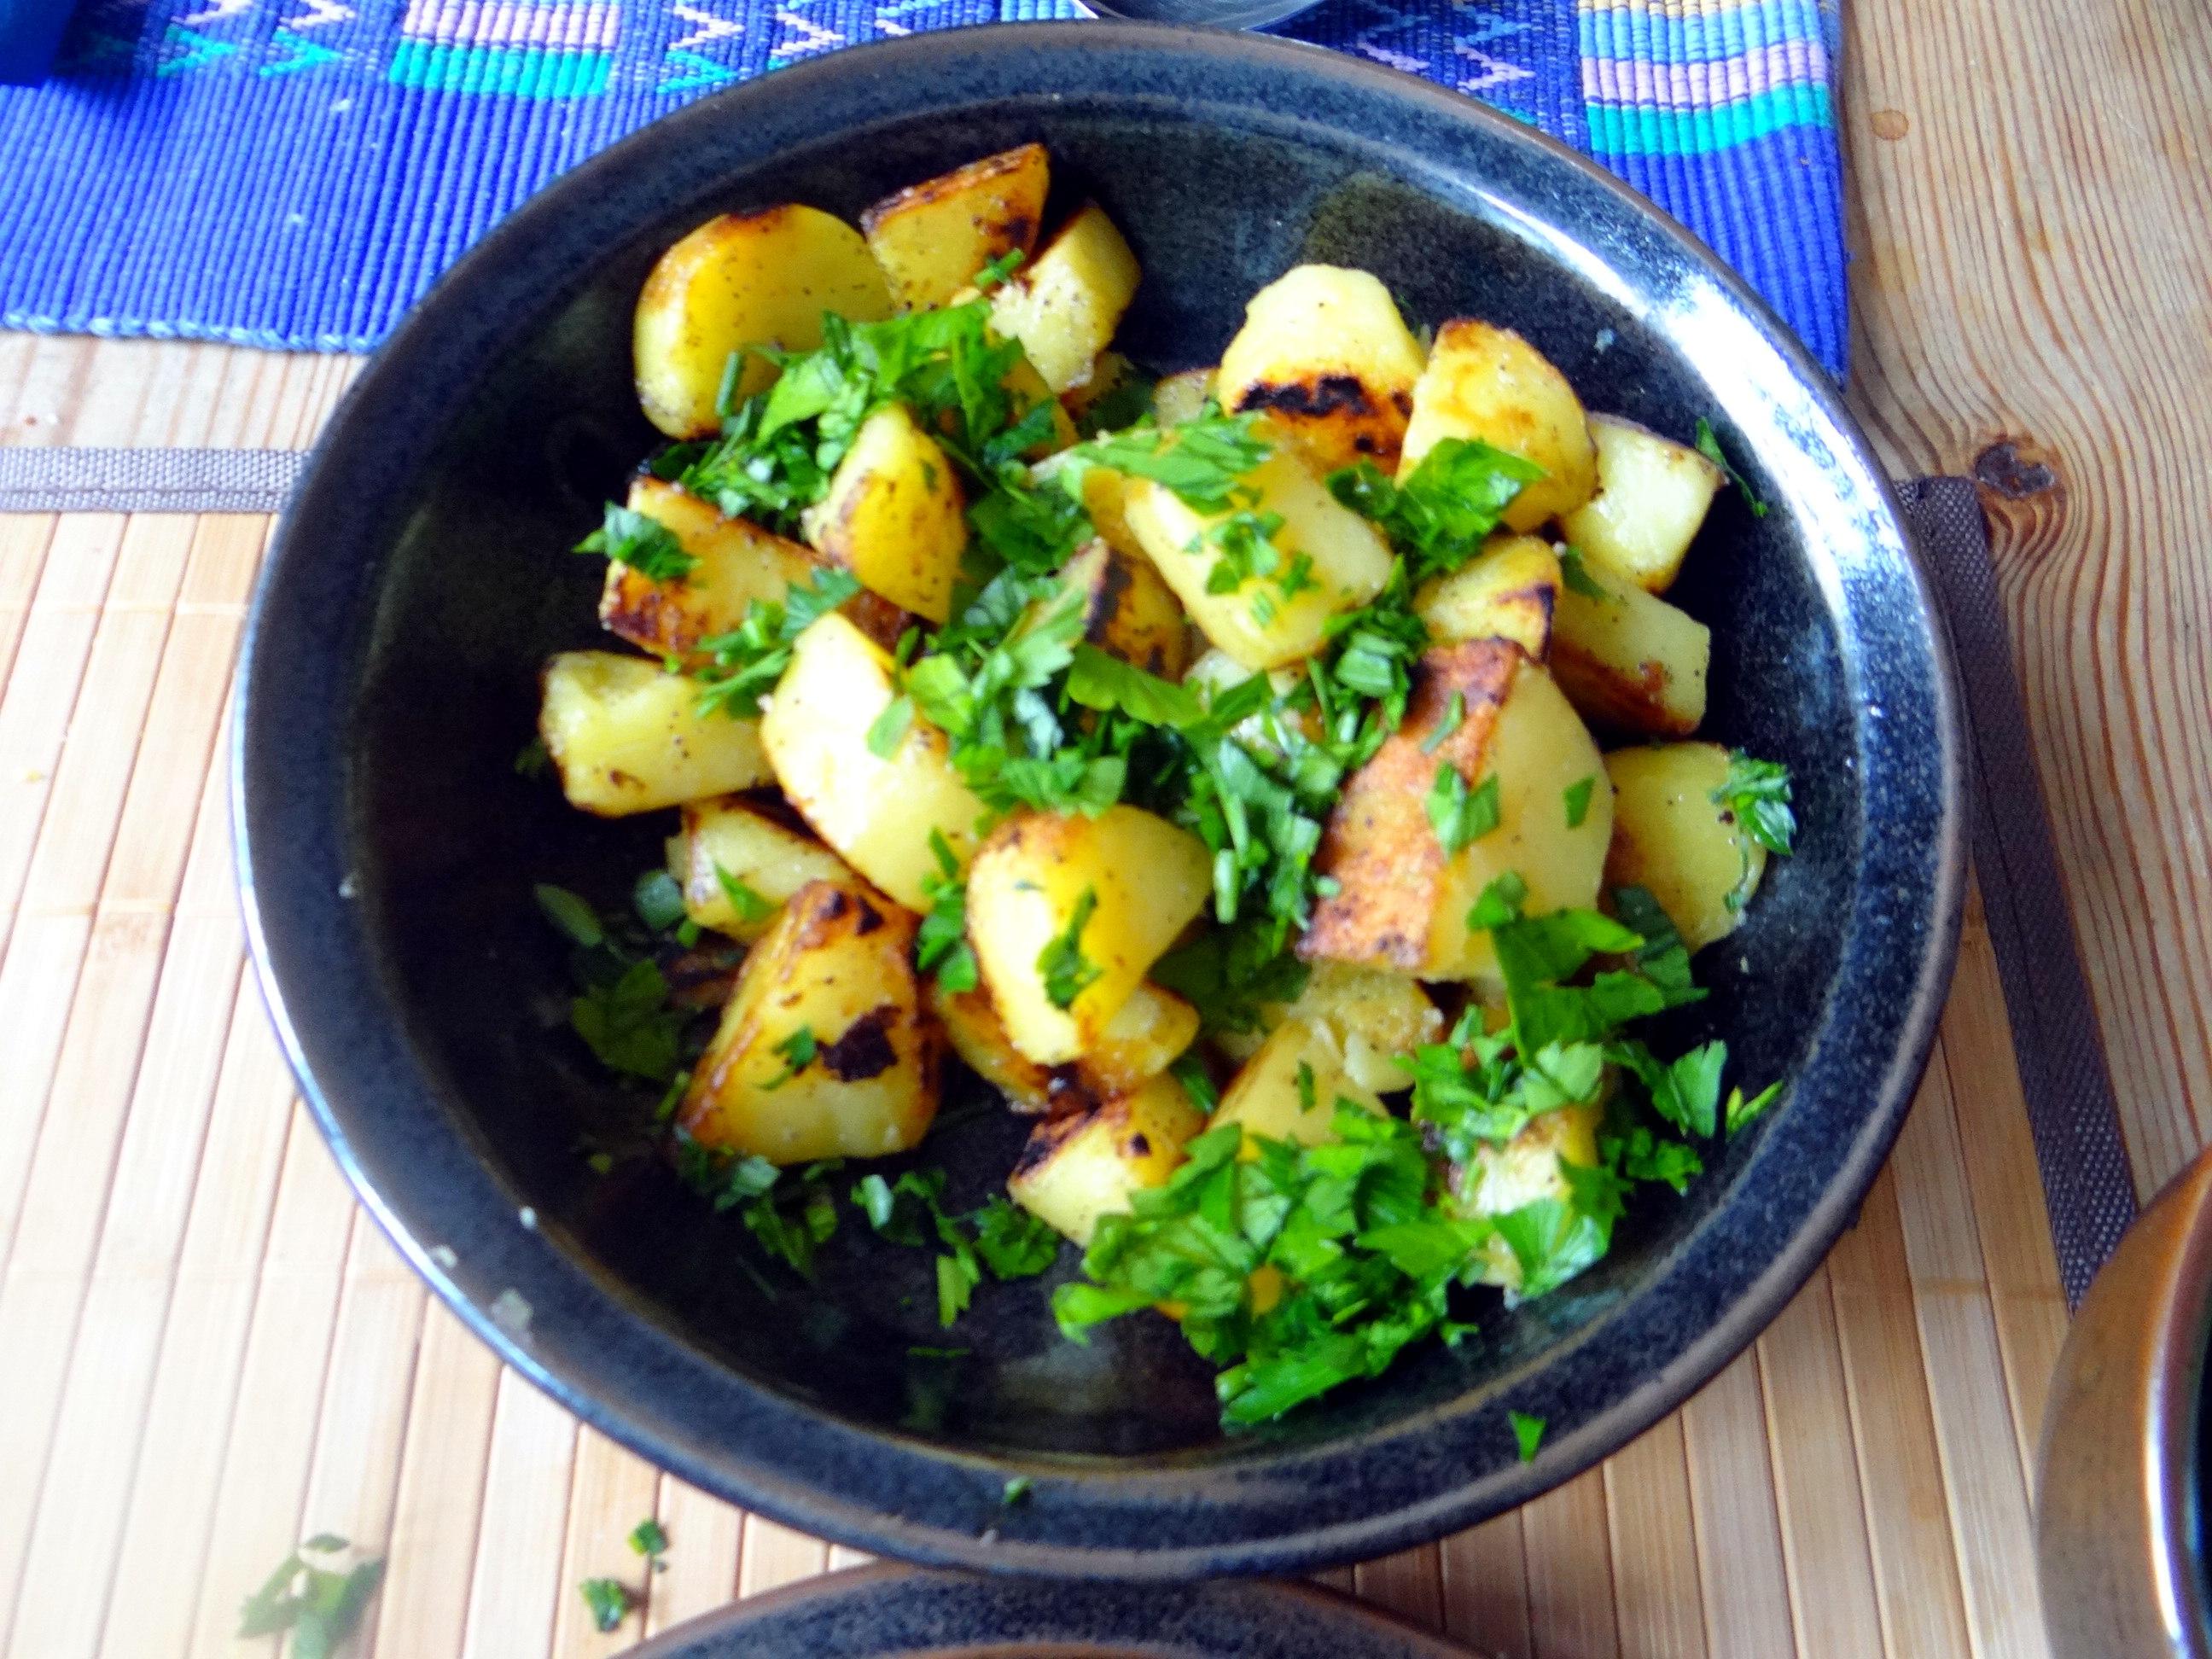 Fritierte Portobello,Bratkartoffeln,Pimientos,Salat,vegan (15)